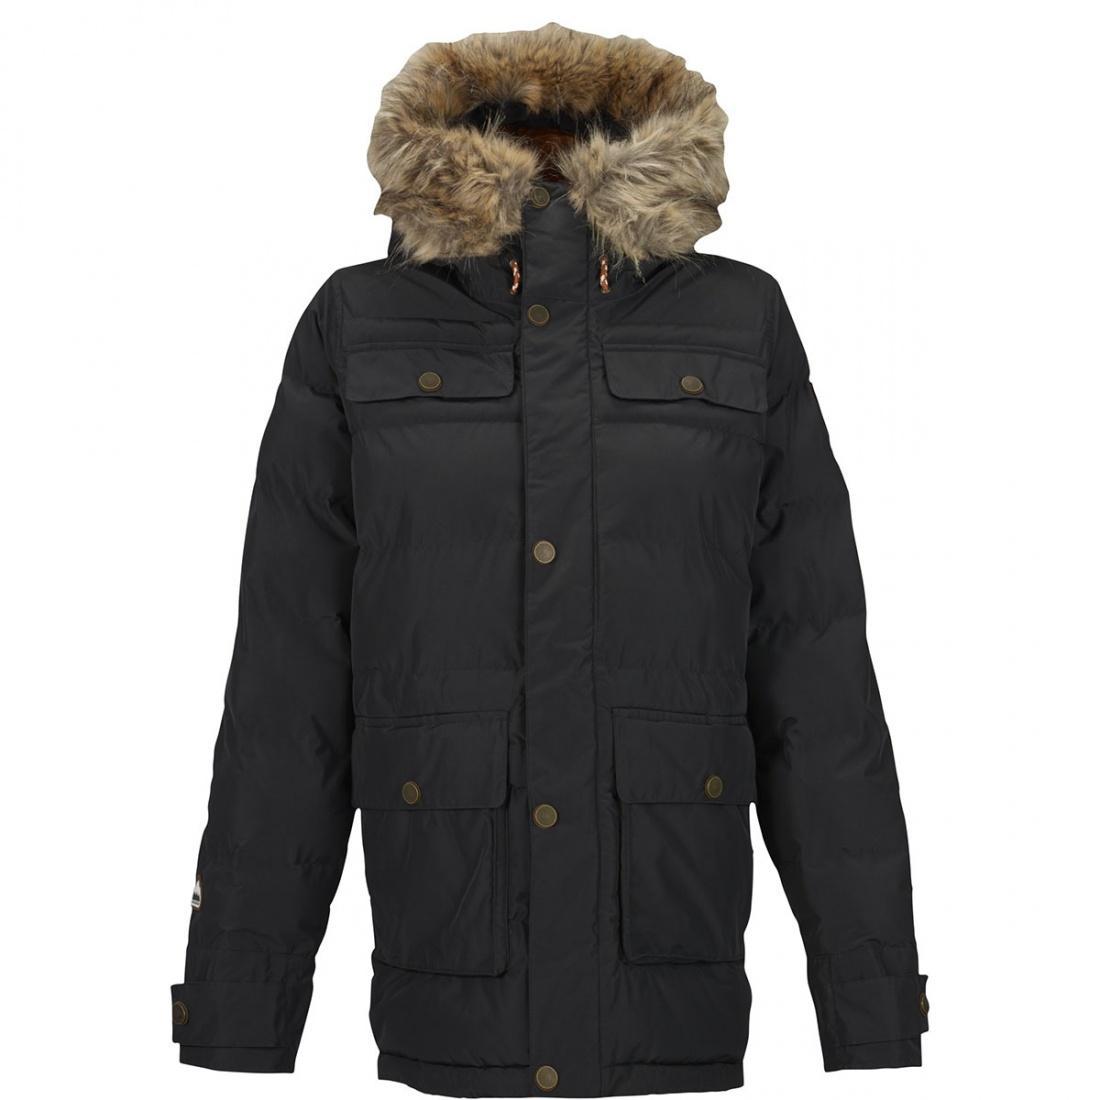 Куртка г/л WB ESSEX PUFFY JKКуртки<br>Удобная мужская куртка<br><br>Мембрана: 10,000mm/ 10,000 g<br>Двухслойный водоотталкивающий материал DRYRIDE Durashell™<br>Утеплитель: bluesign® THERMOLI...<br><br>Цвет: Черный<br>Размер: M